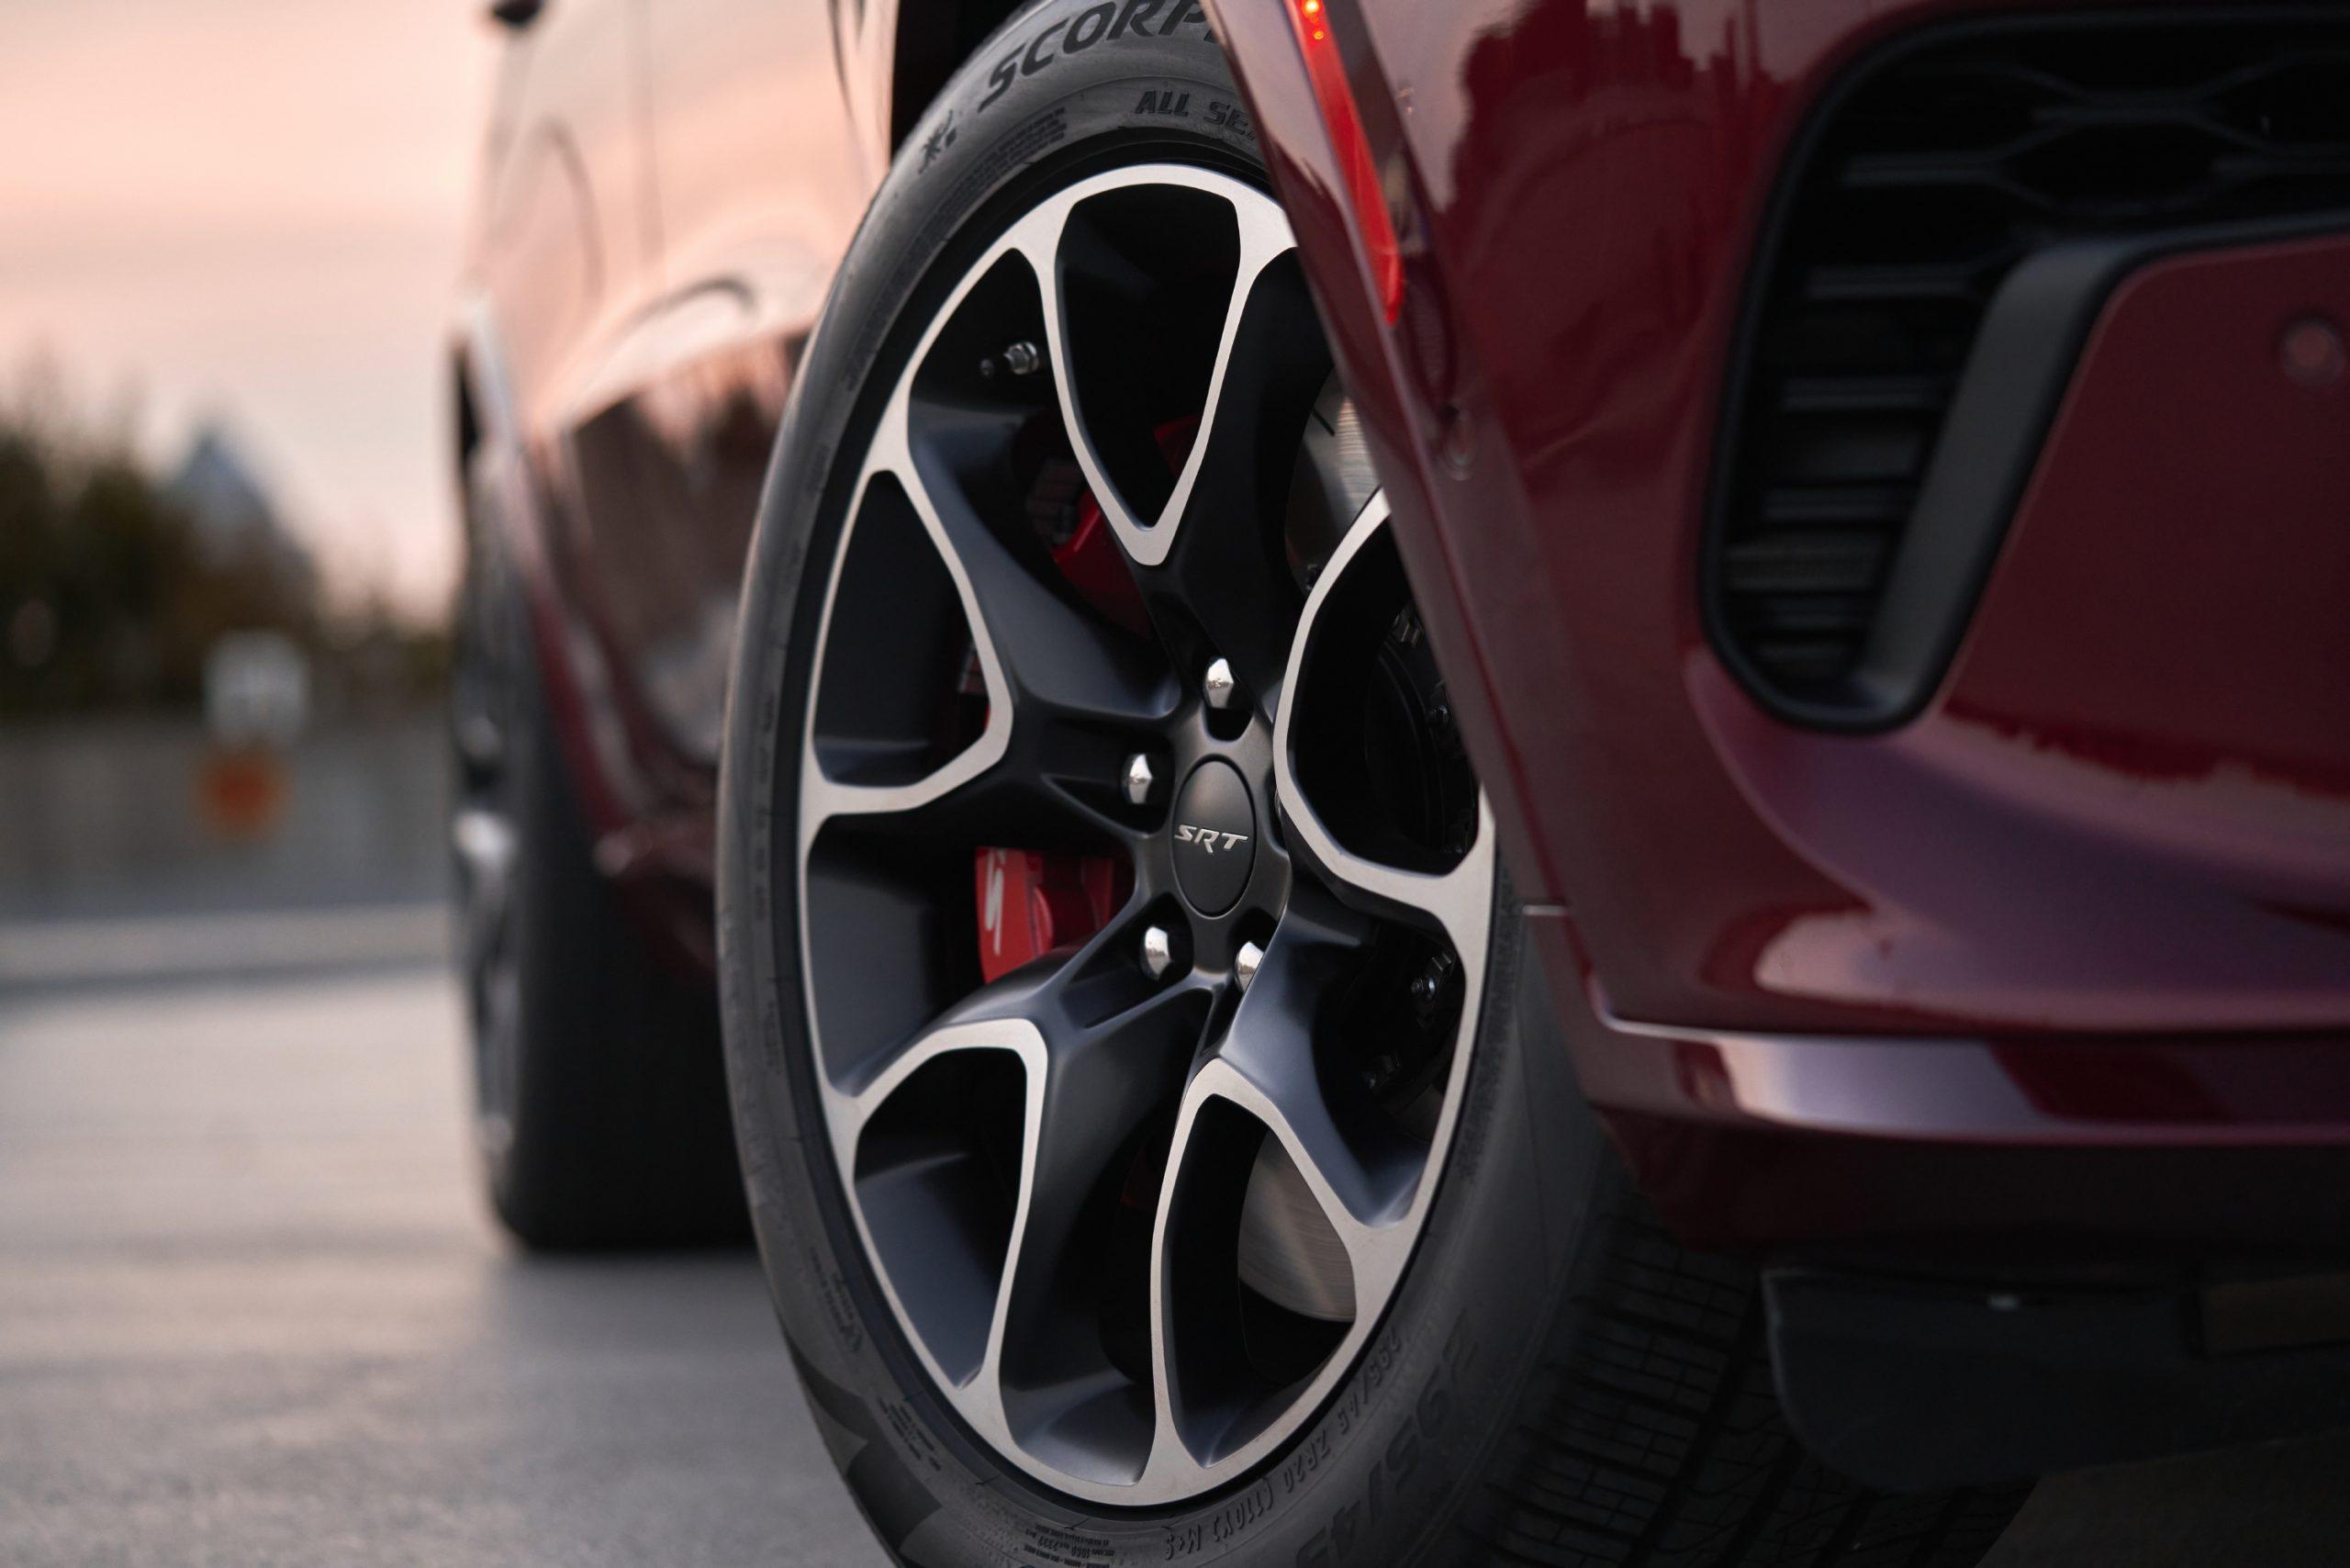 2021 Dodge Durango SRT Hellcat front wheel detail